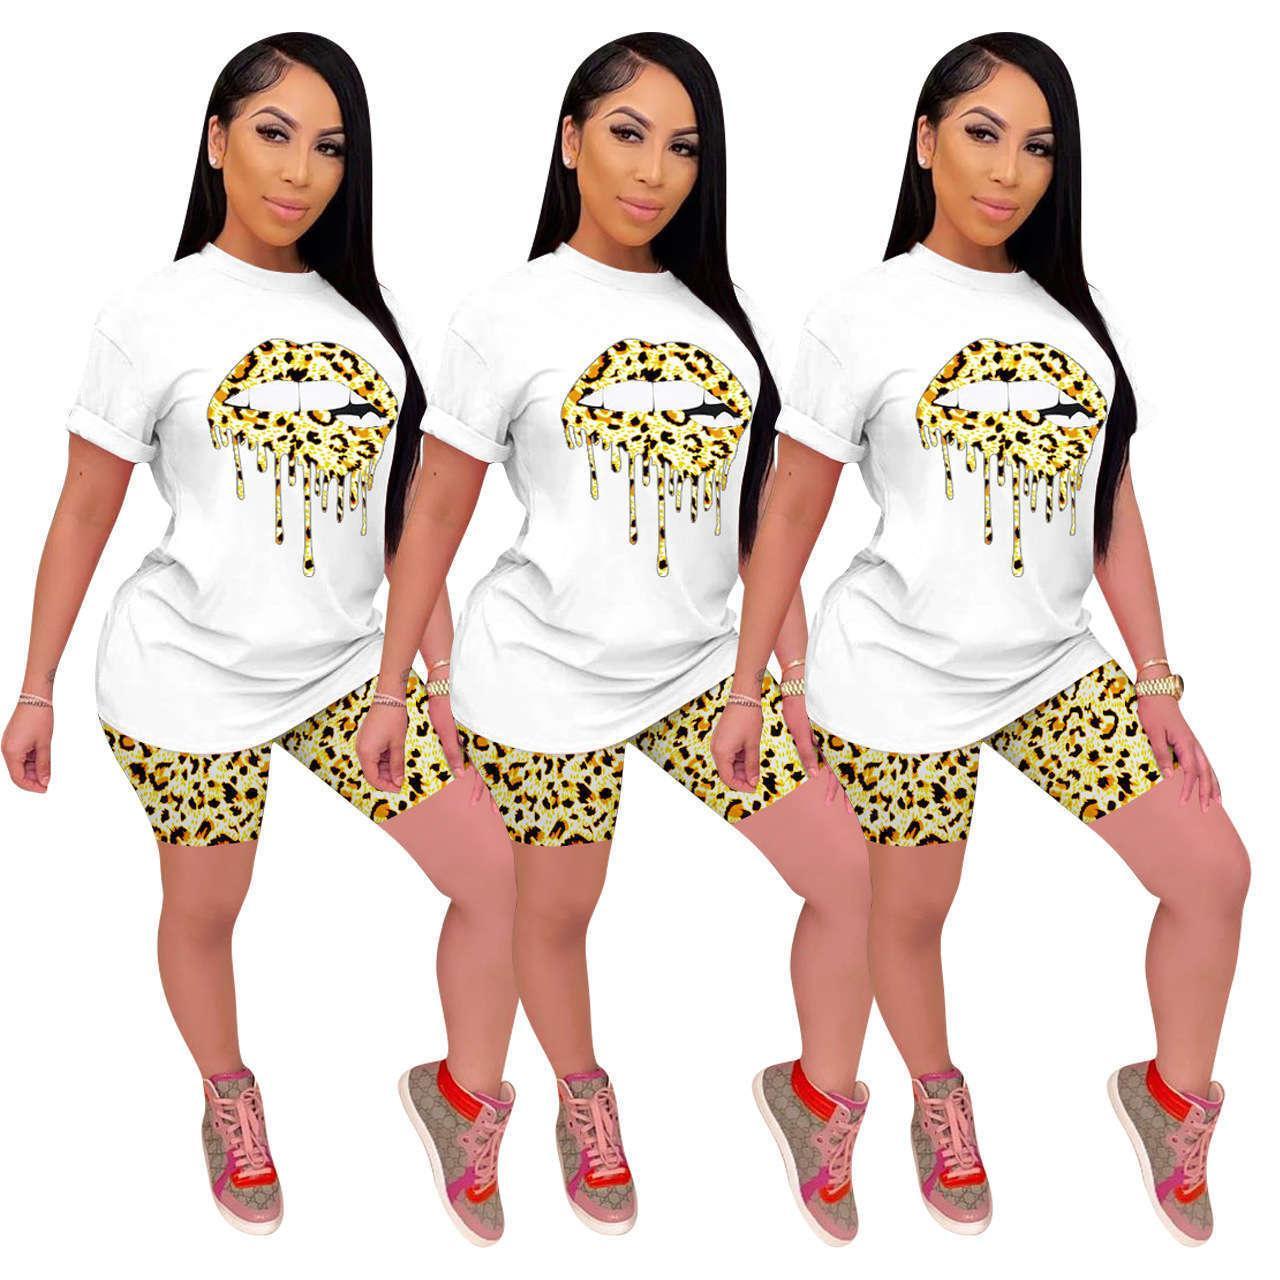 Imprimir Trajes de manga corta de verano Tshirt Tshirt Casual Shorts Famale Designer Sport Traje para mujer Leopardo